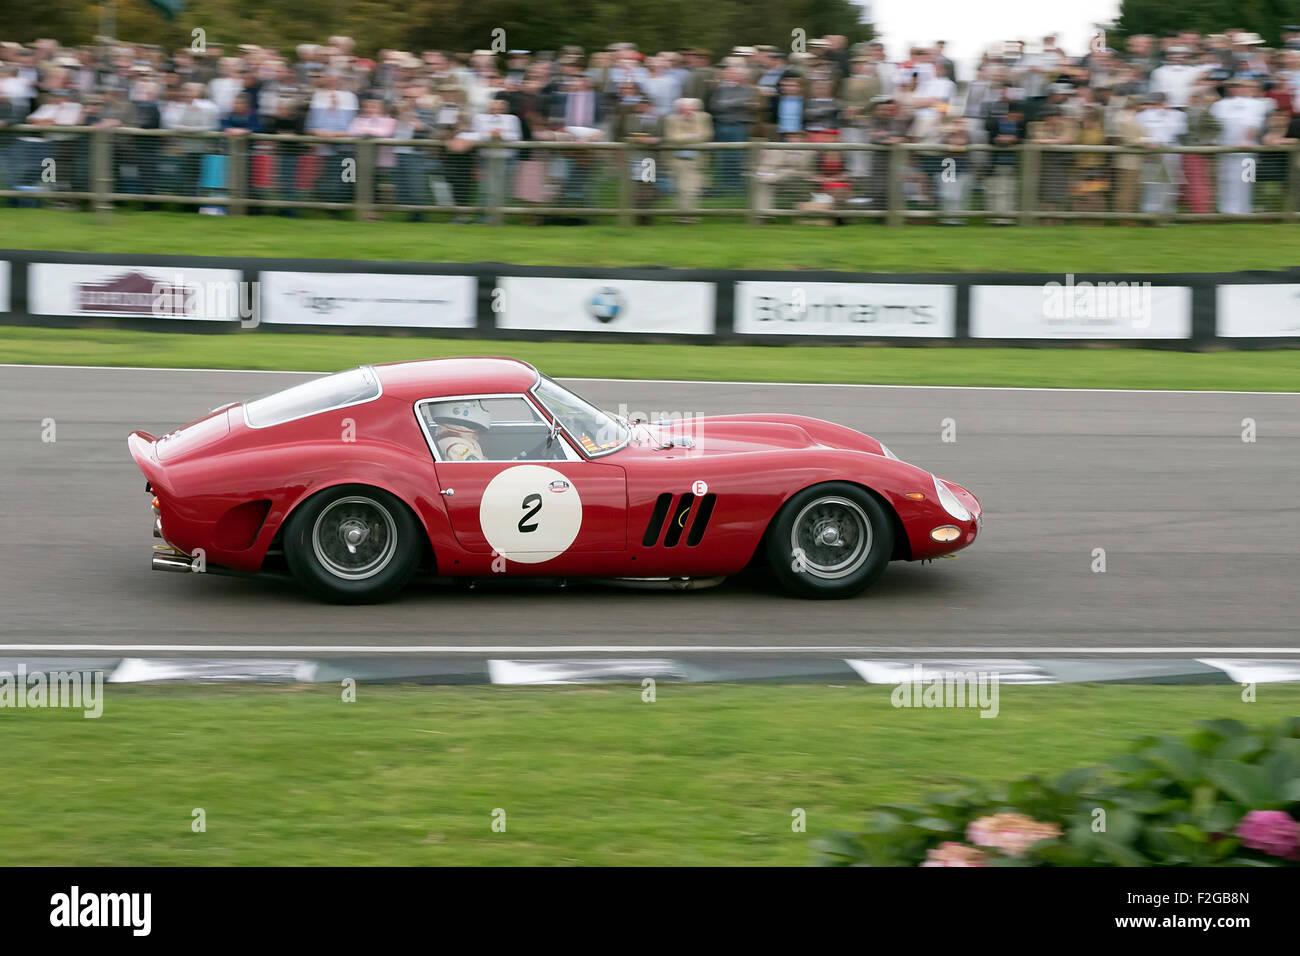 Motor Racing Ferrari Paddock Stockfotos & Motor Racing Ferrari ...